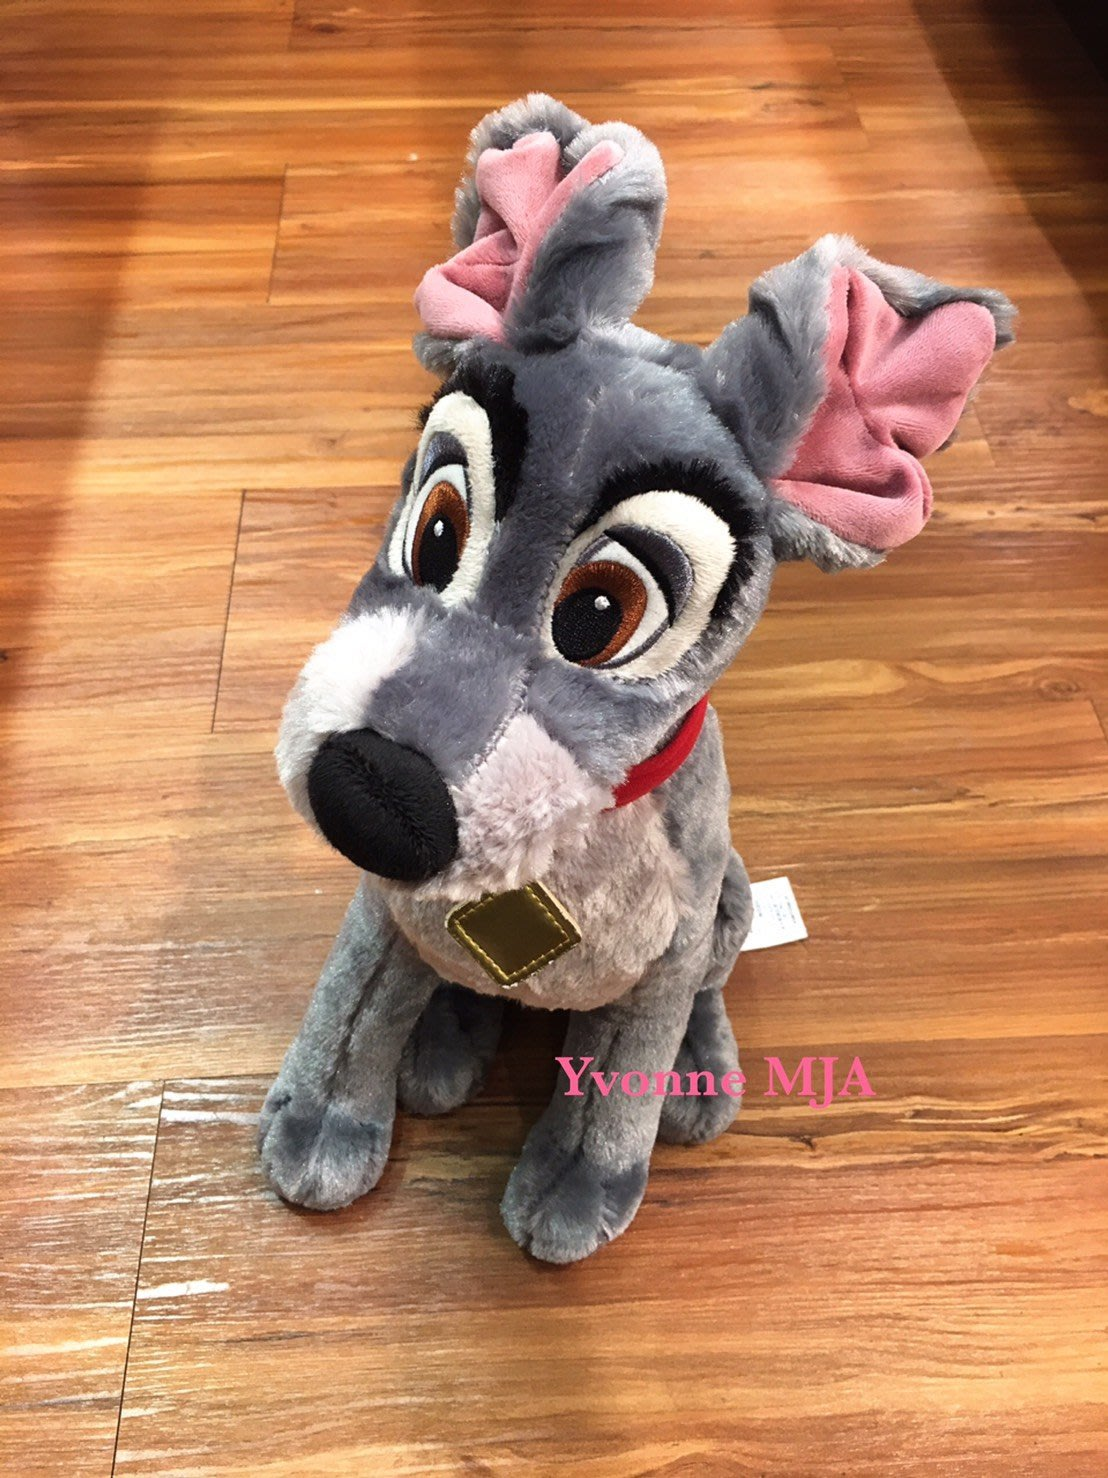 *Yvonne MJA*美國迪士尼Disney 商店限定正品小姐與流氓 (流氓Tramp)大型娃娃